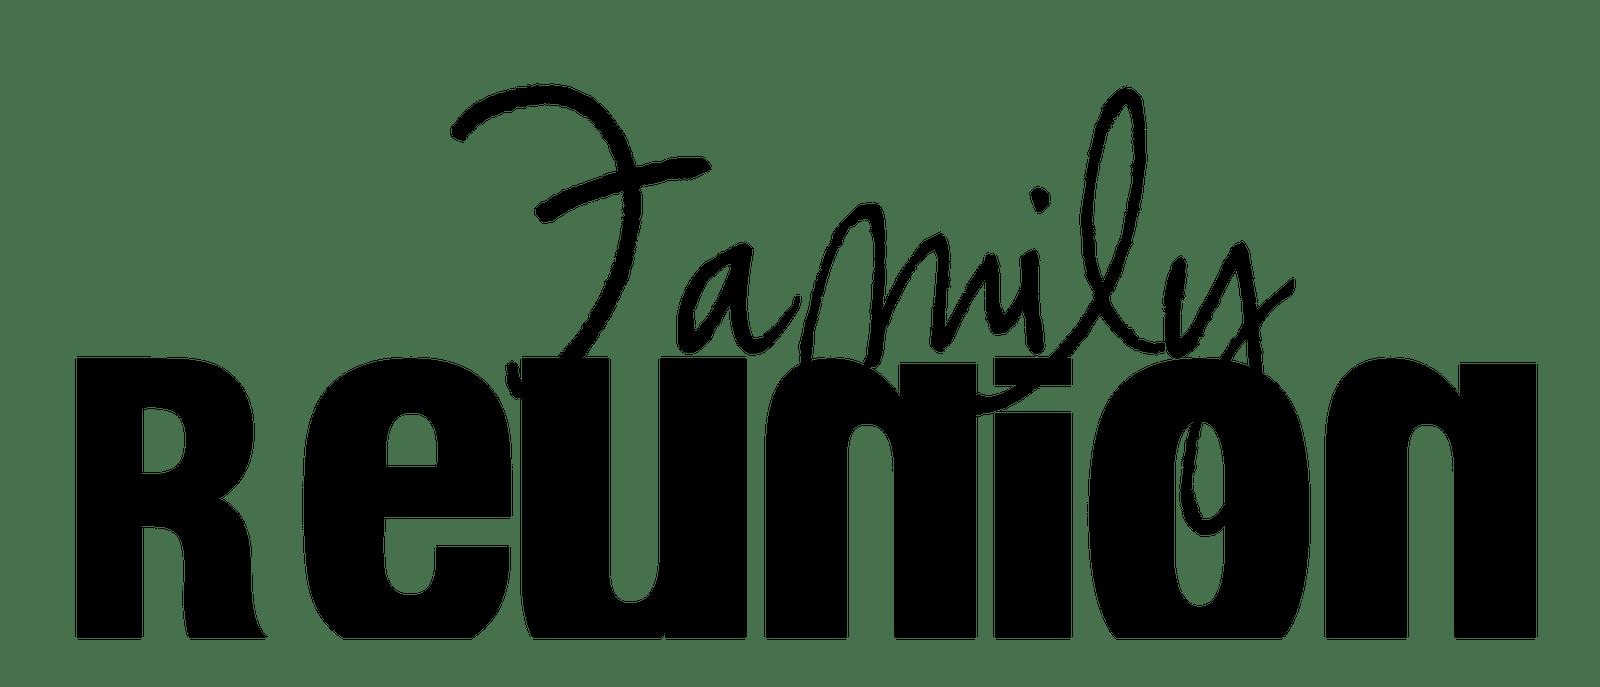 Free Reunion Cliparts, Download Free Clip Art, Free Clip